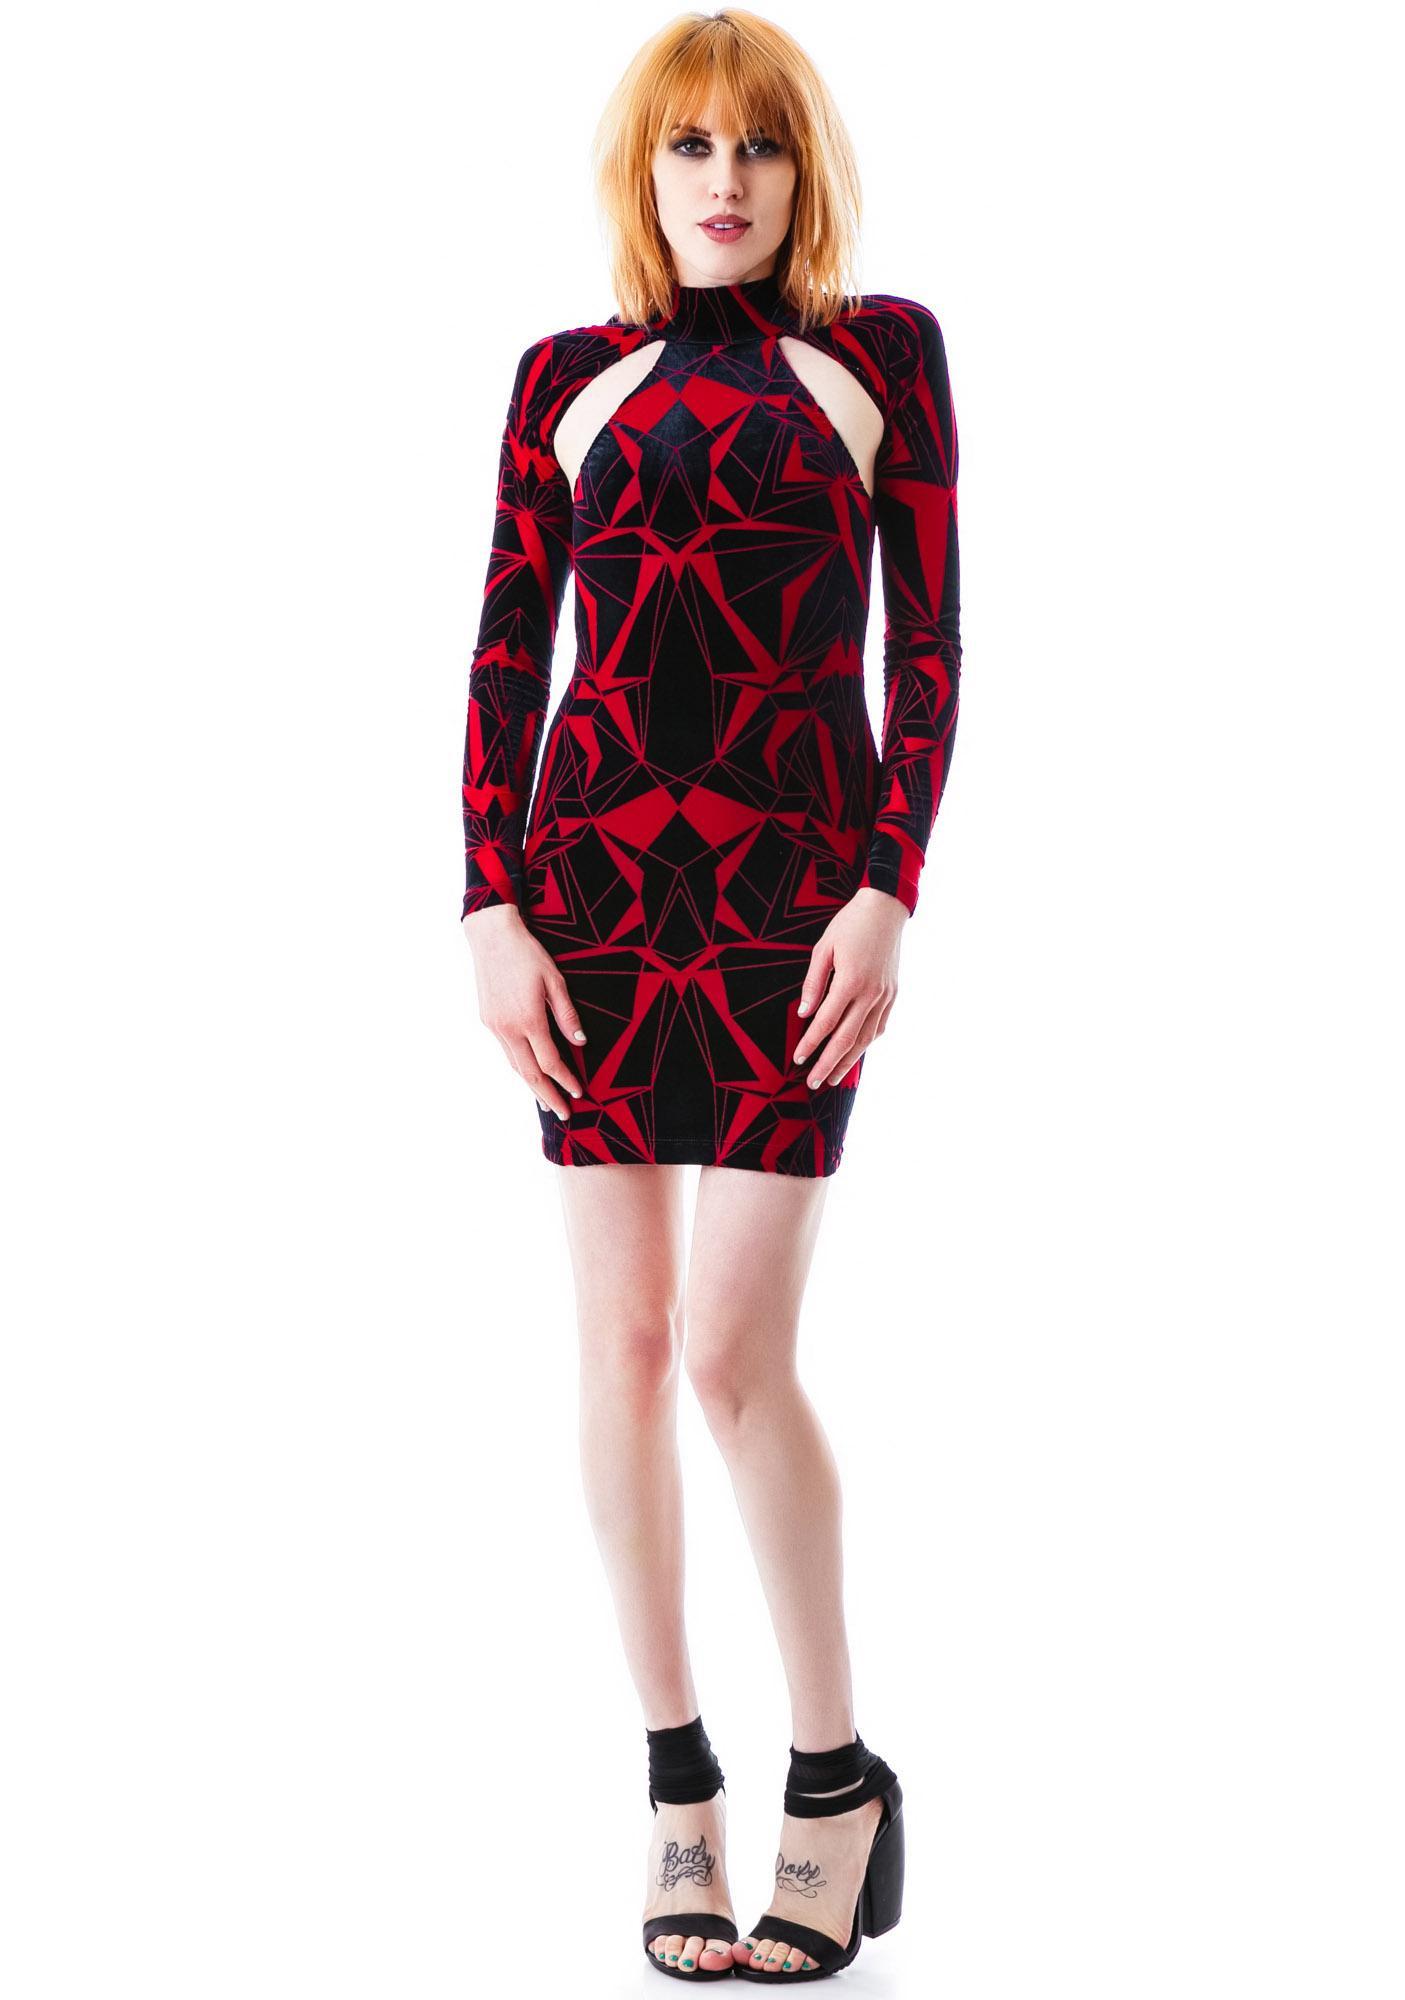 Lip Service Burnout Velvet Dress